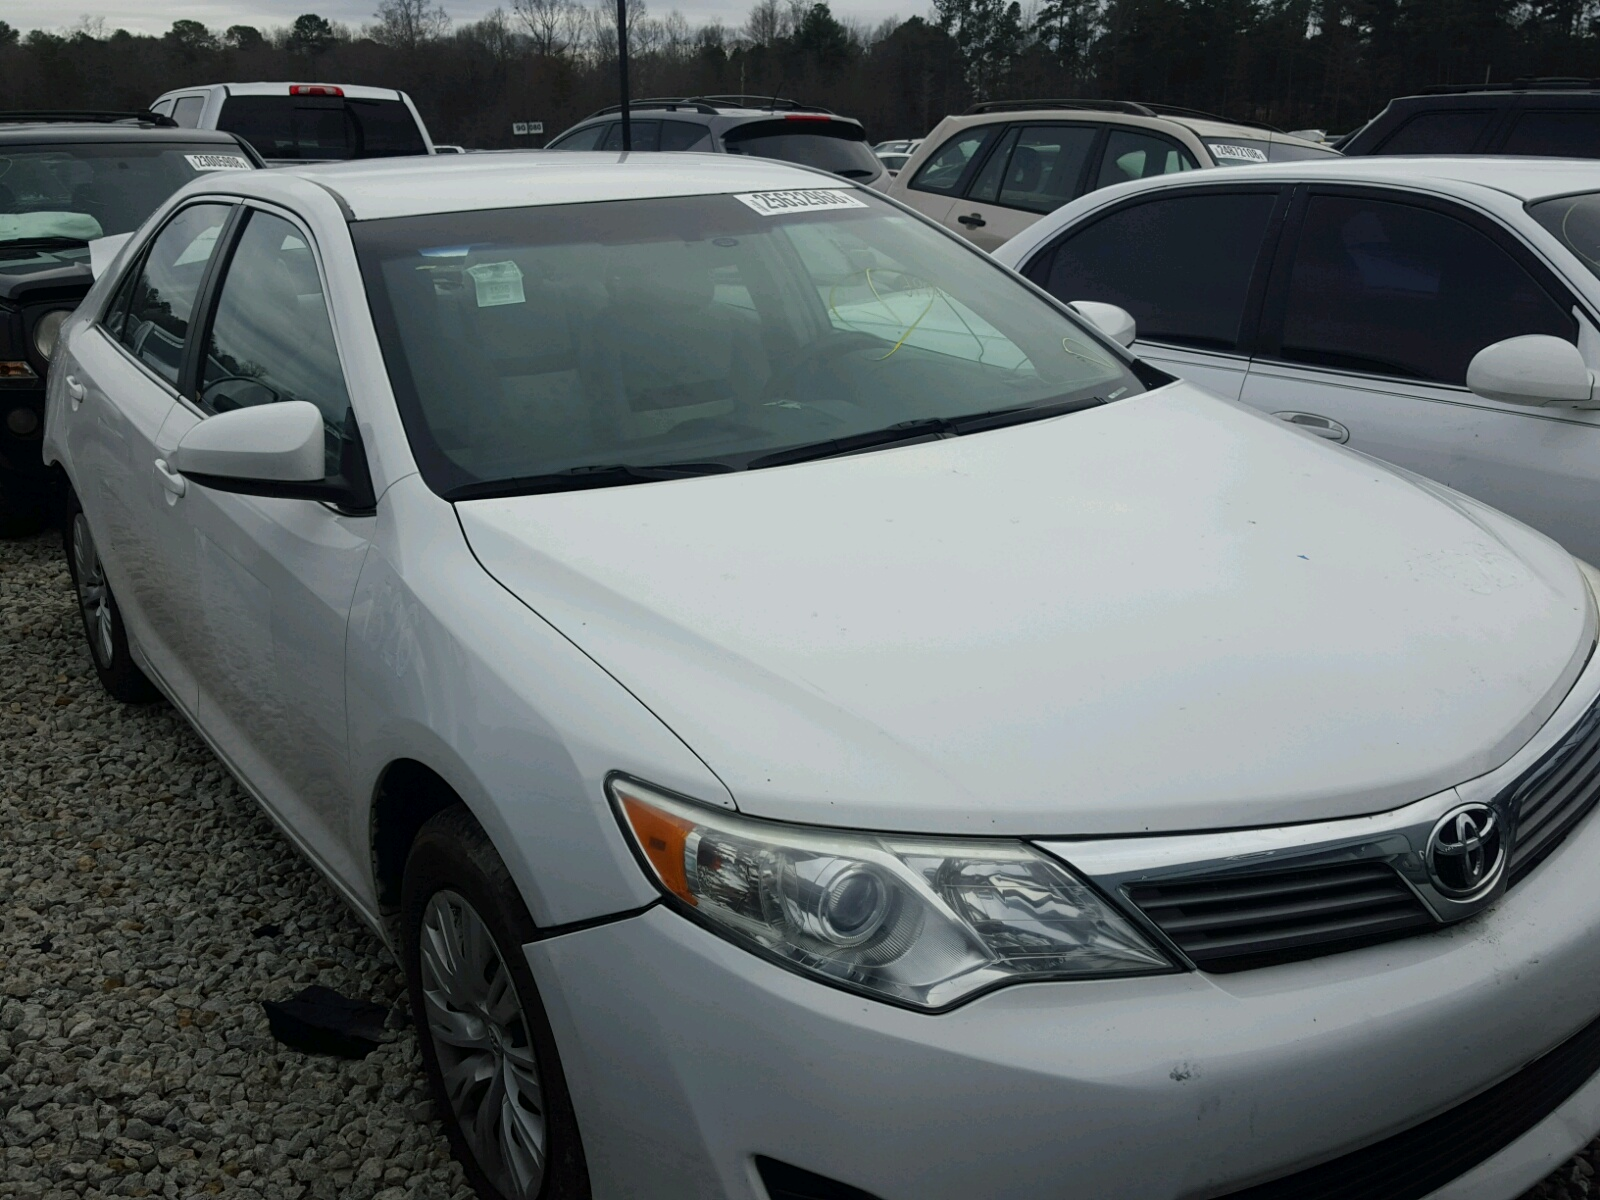 Auto Auction Ended On Vin Jtegh20v020053505 2002 Toyota Rav4 In Tn Nashville